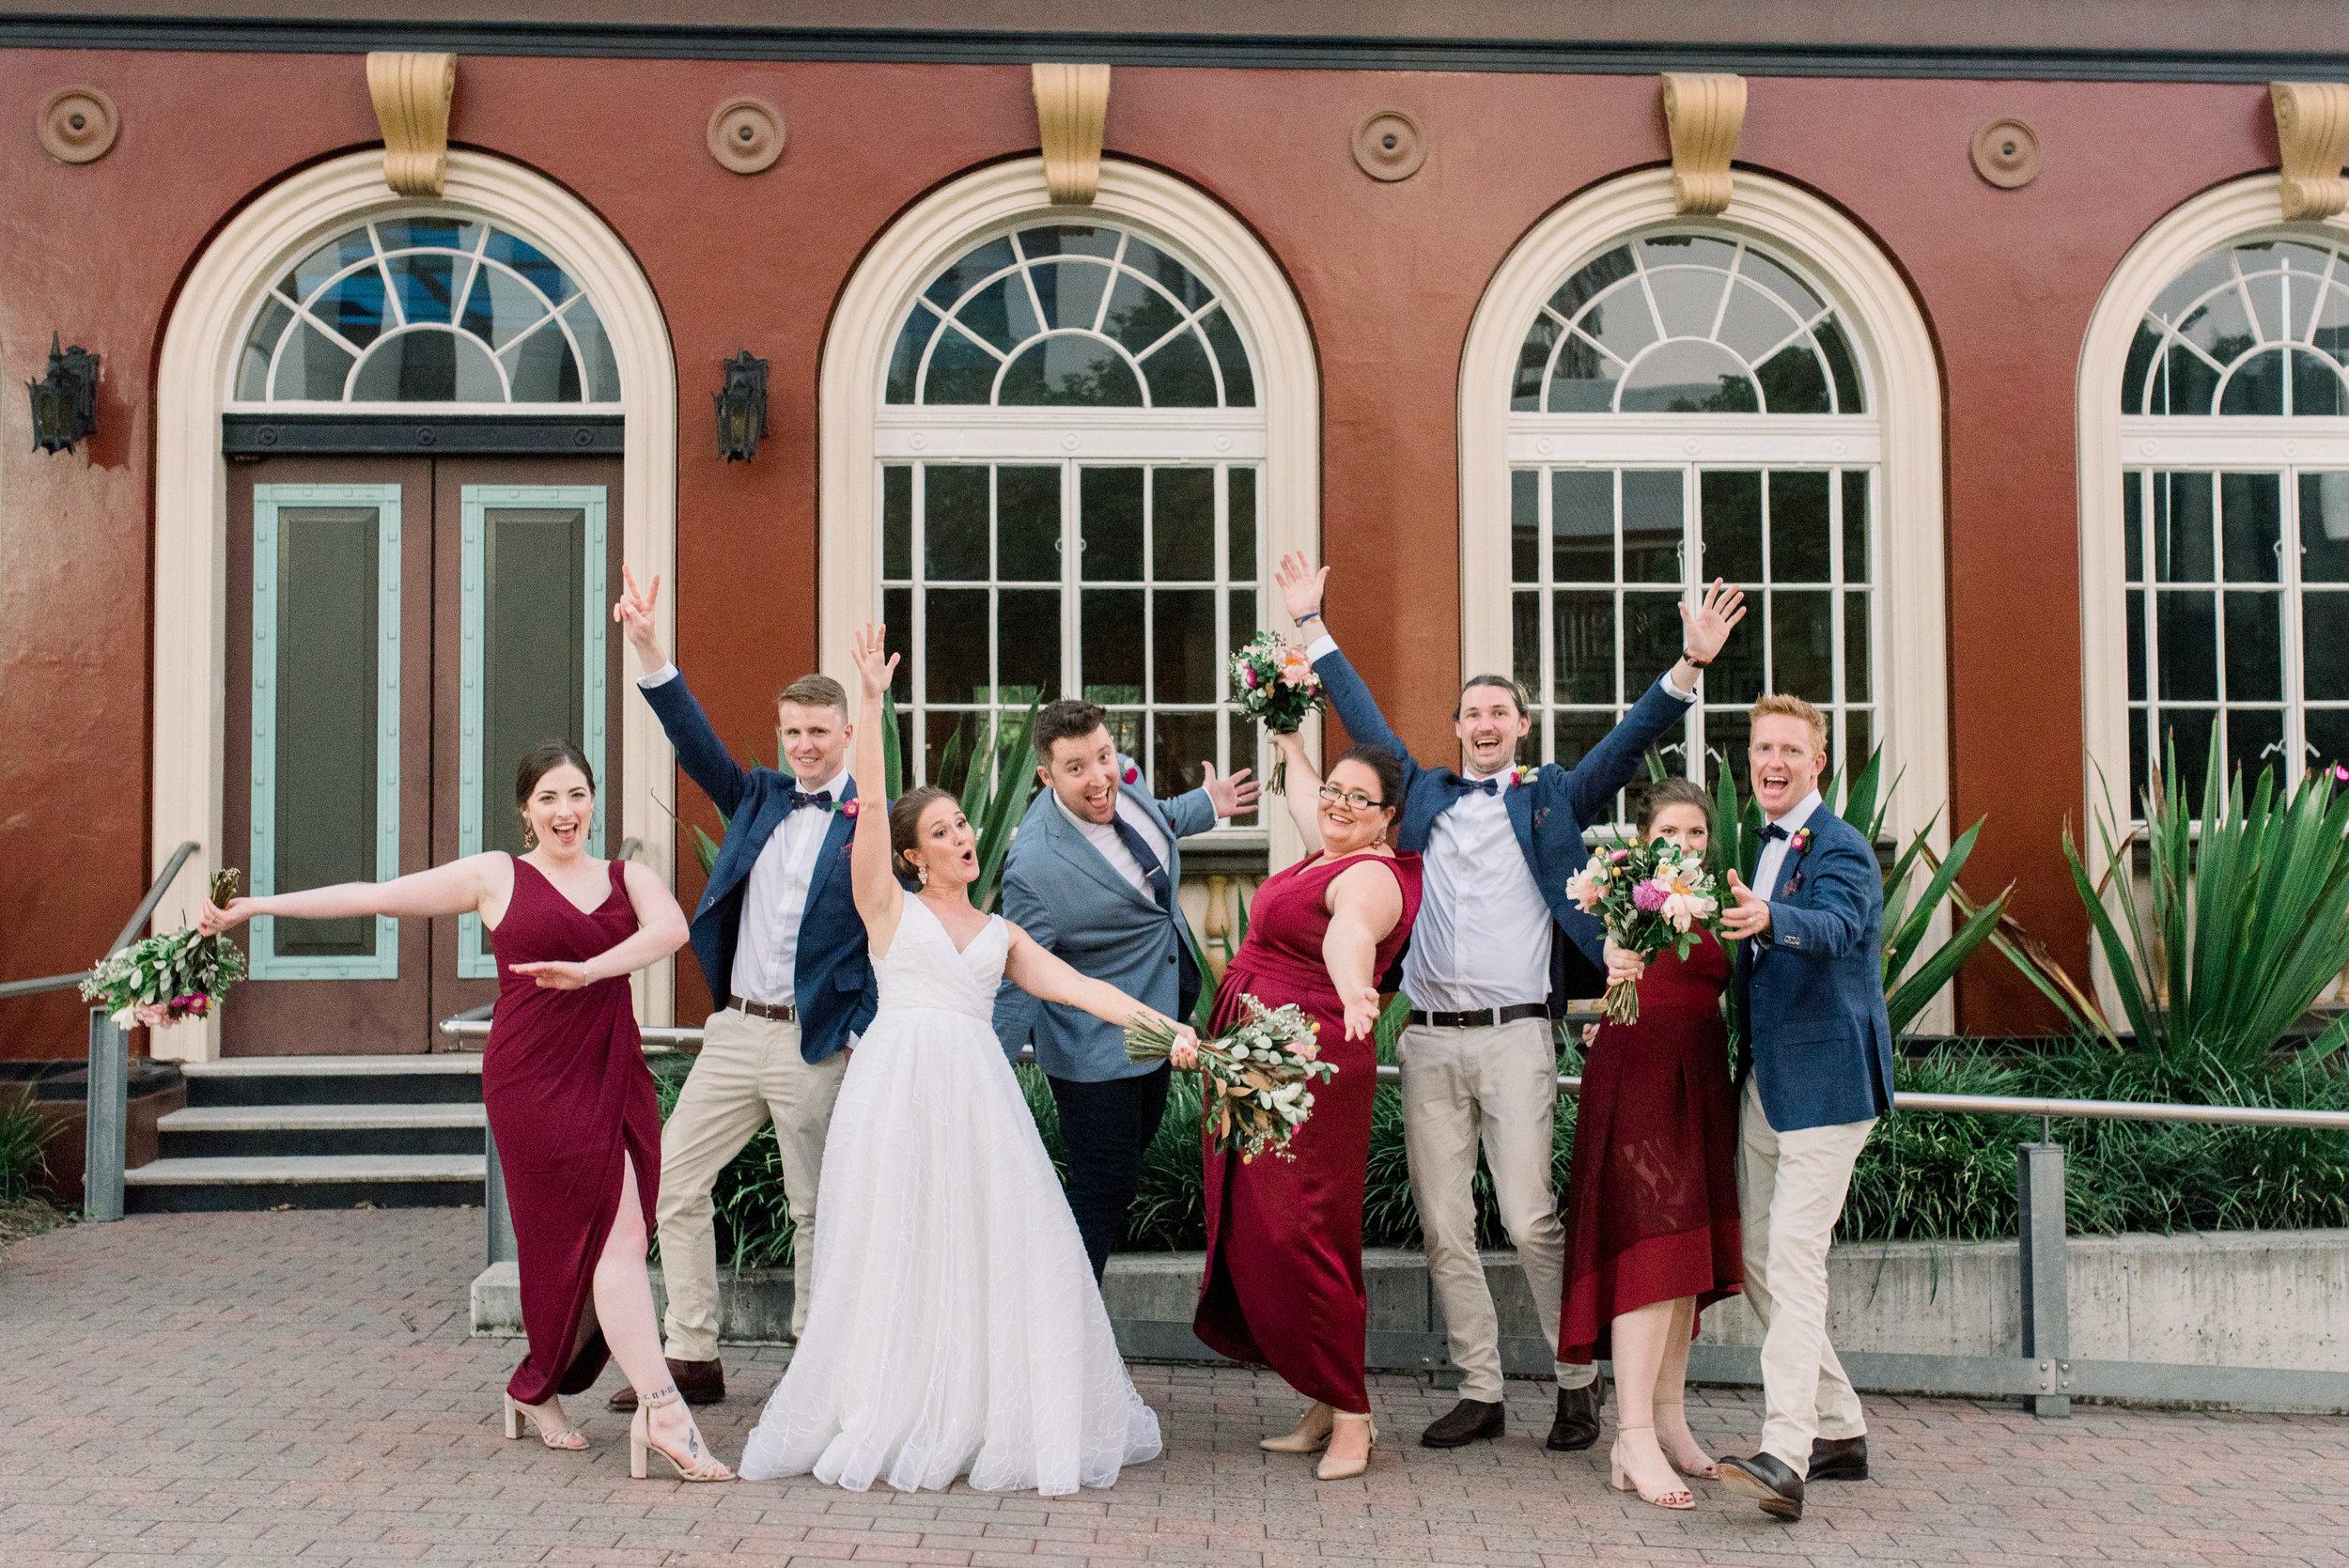 refinery-wedding-brisbane-city-wedding-photographer-77.jpg